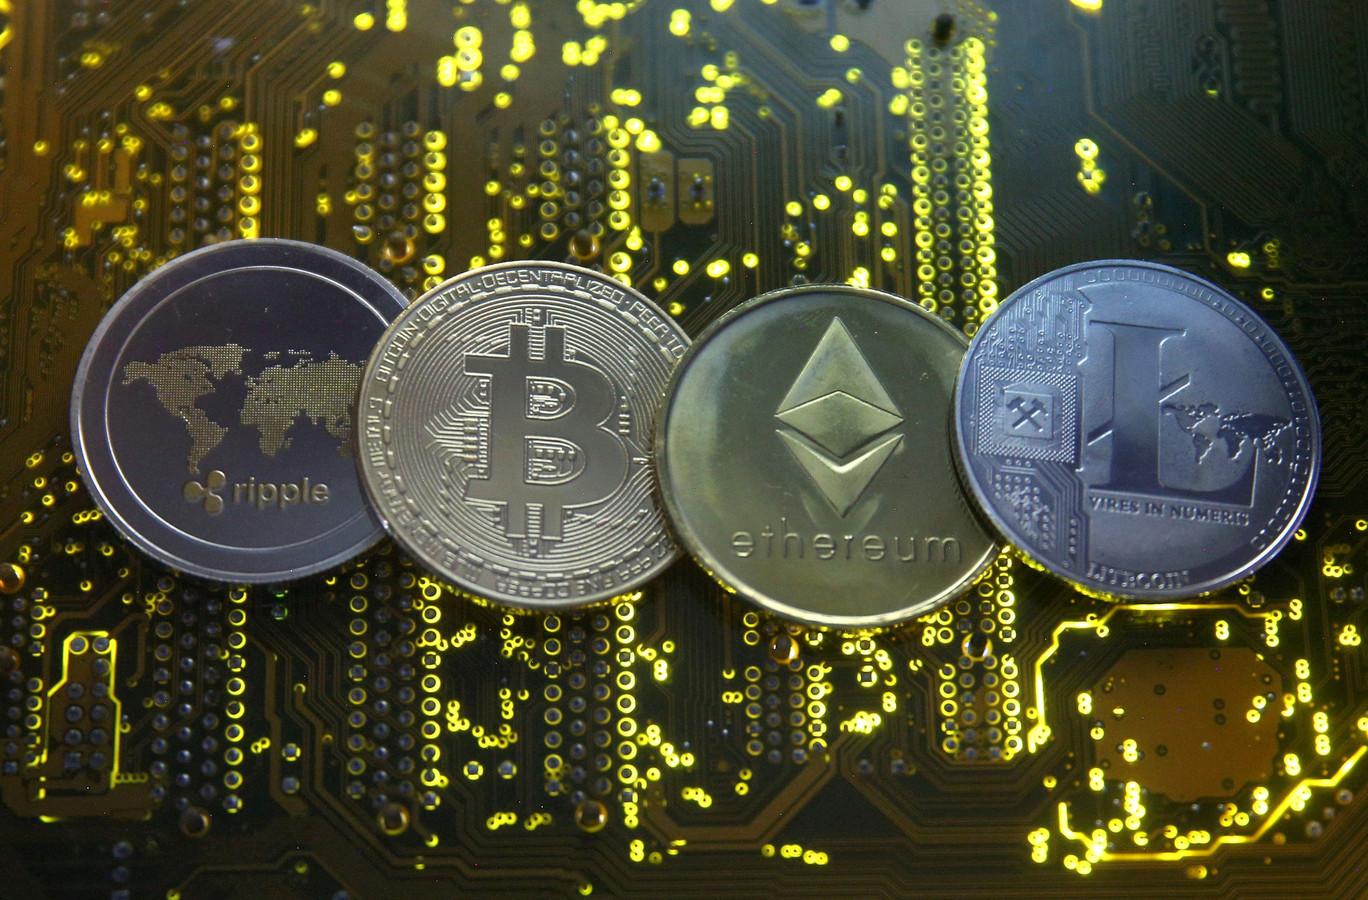 Zo zouden cryptovaluta ripple, bitcoin, ethereum en litecoin eruitzien als ze daadwerkelijk in muntvorm bestonden.